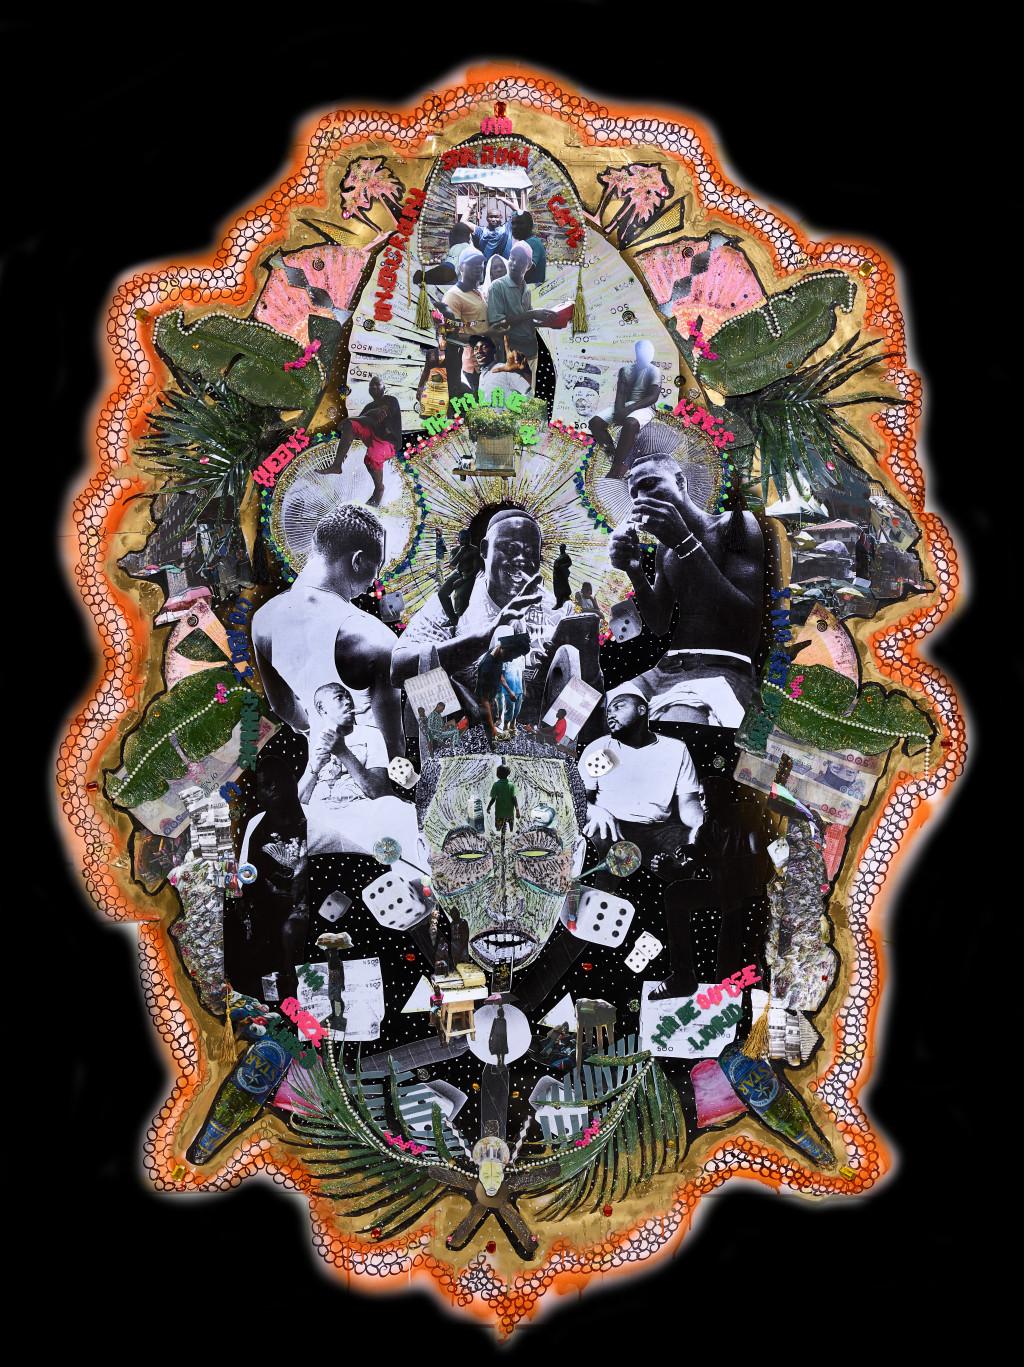 Raquel van Haver, A Shrine of a Deity: L'enyin ise aye Lo Ku, 2018. Photo of collage, diasec. Courtesy the artist. Photo: Hans Wilschut.